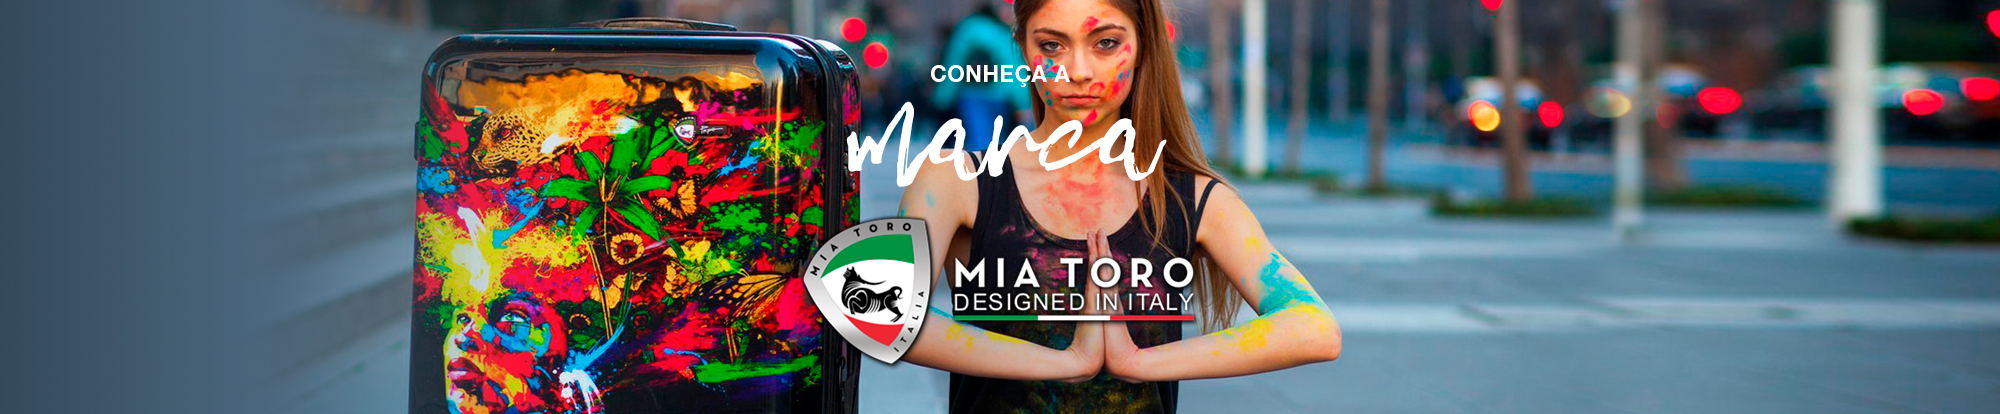 Banner Marca Mia Toro